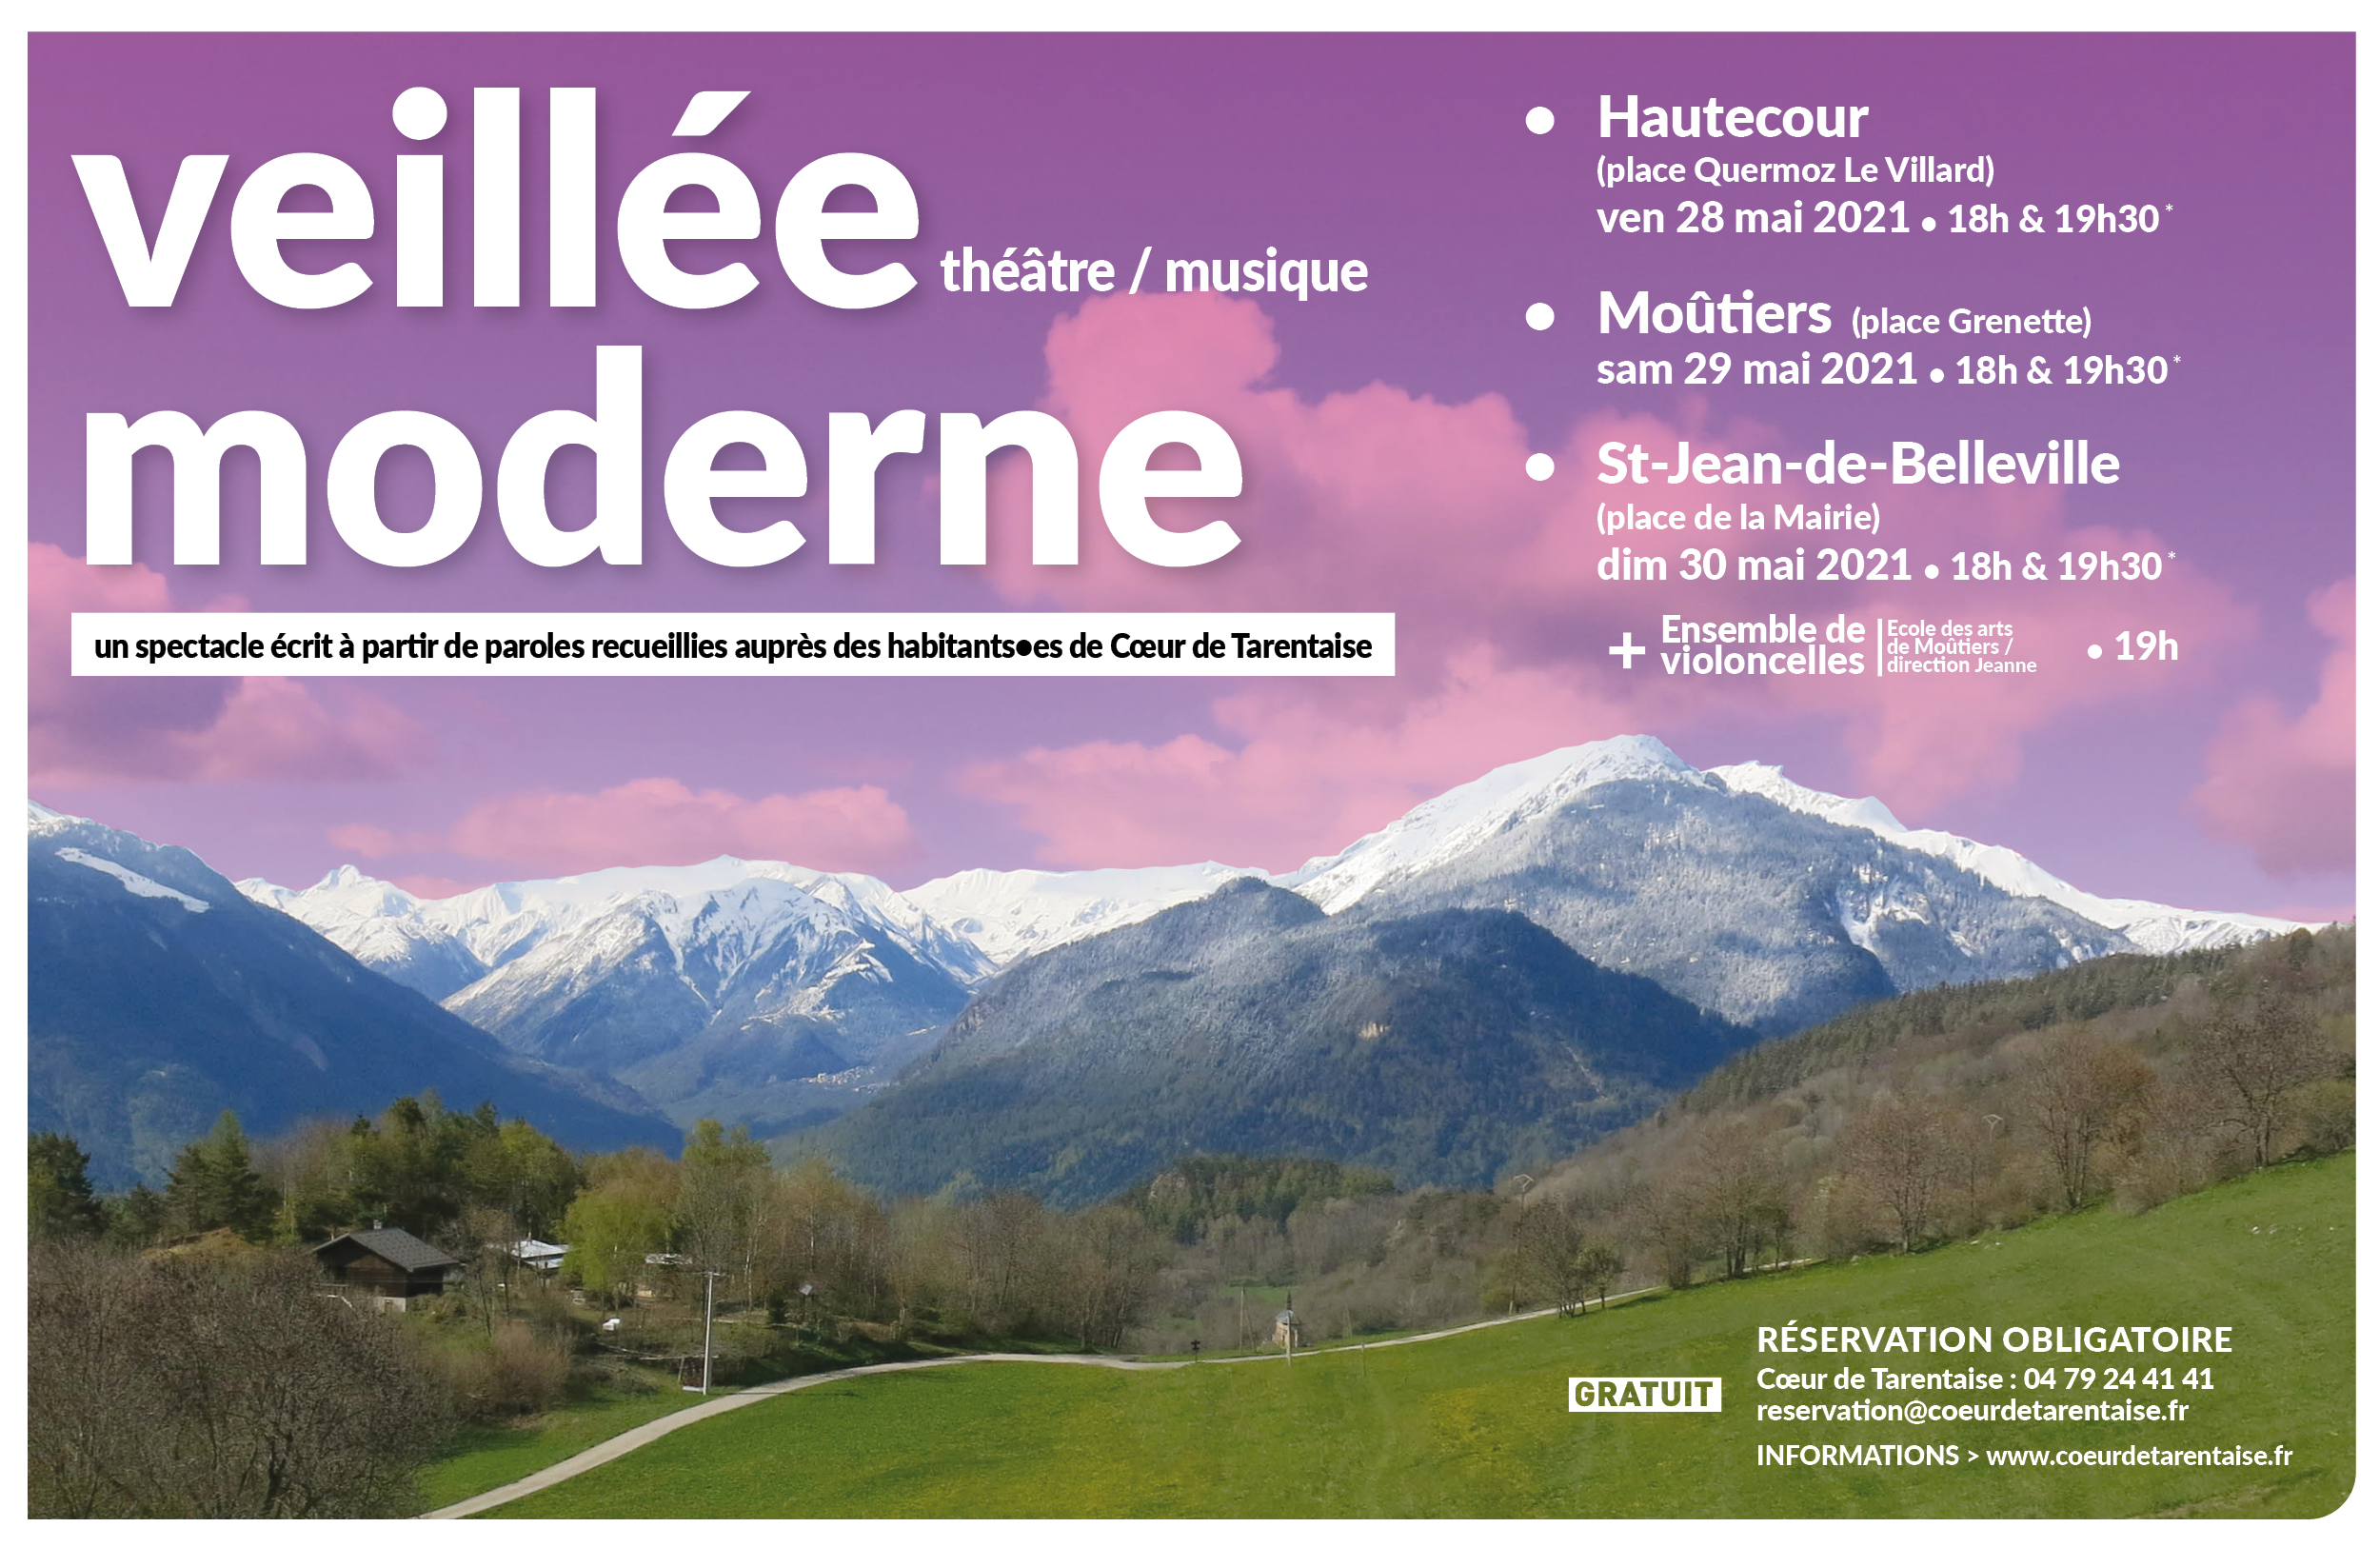 """Veillée moderne"" un spectacle itinérant"